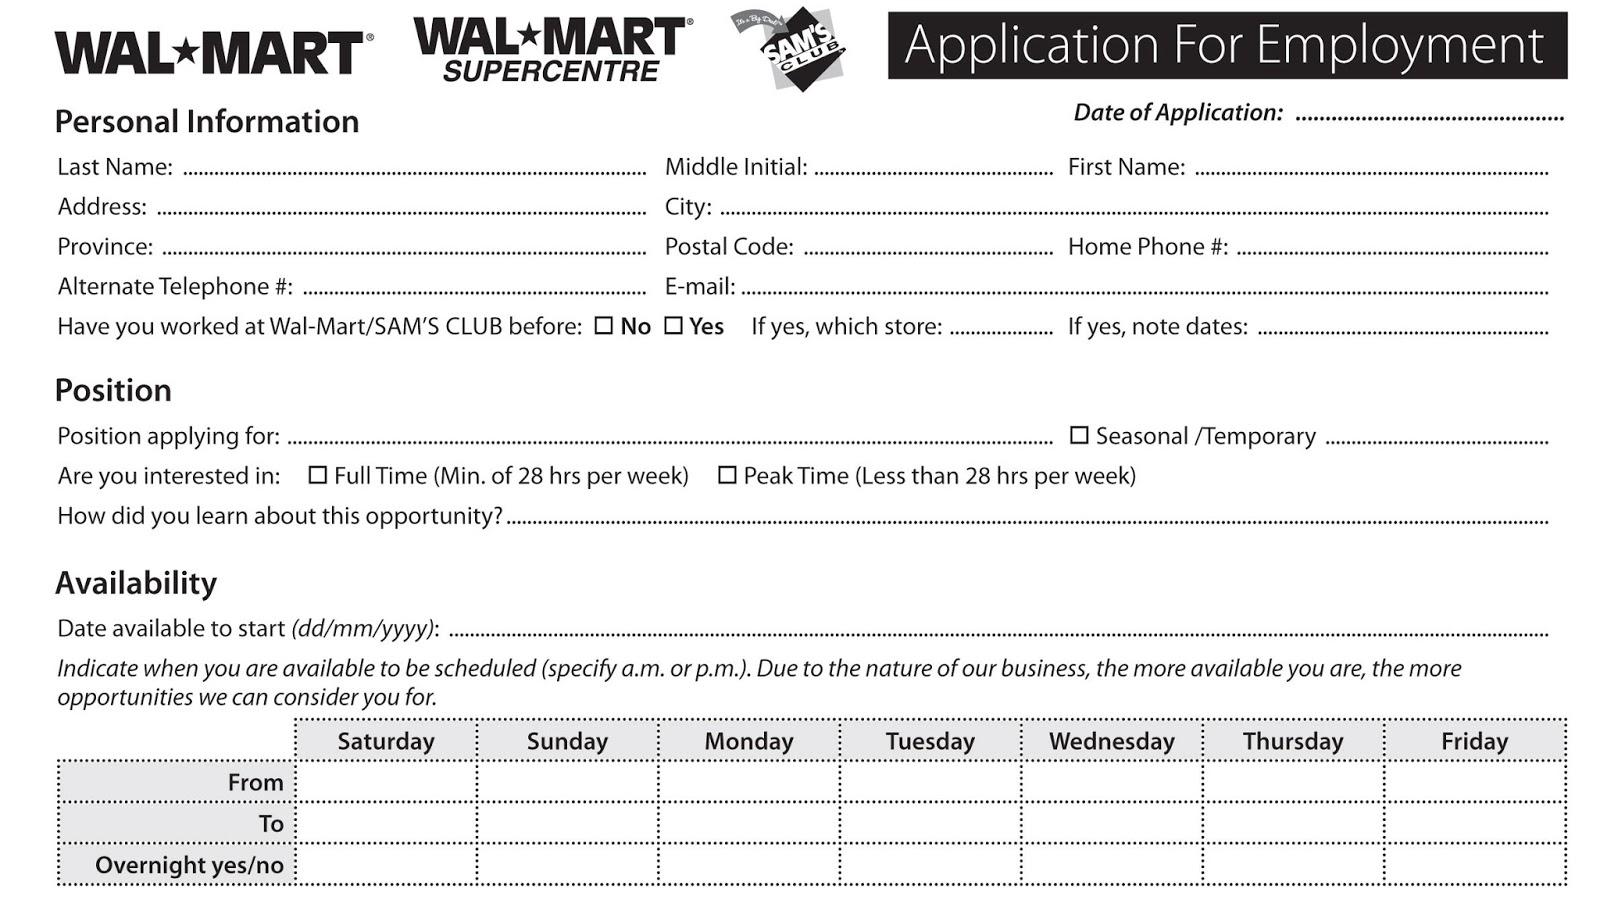 walmart online job application for employment excel template